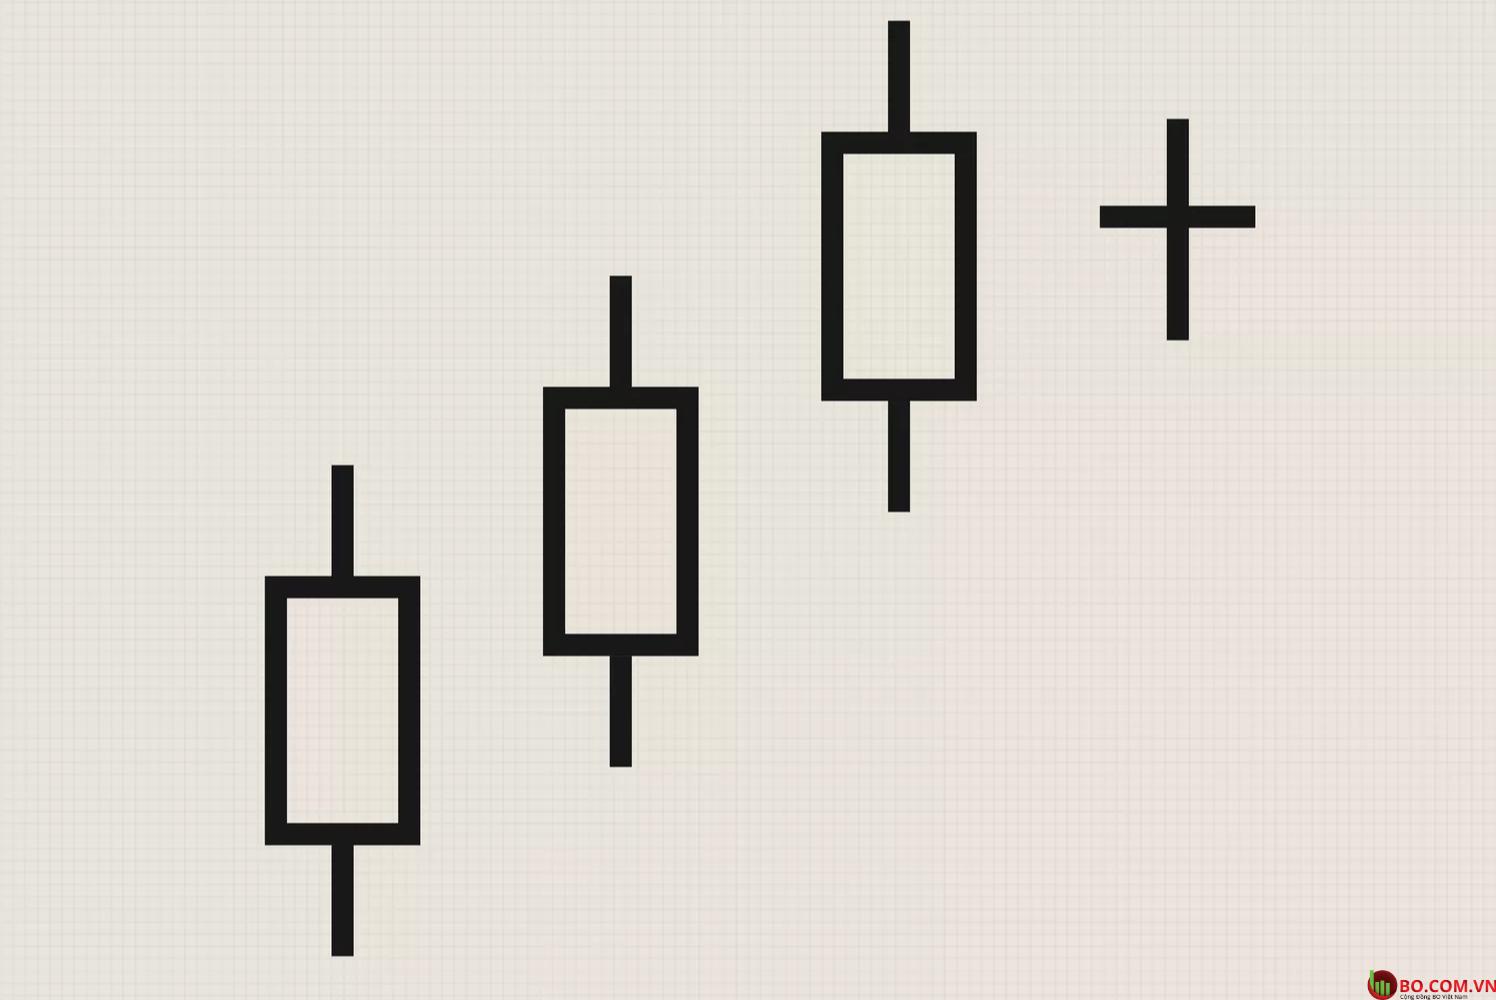 Mô hình Bearish Harami Cross